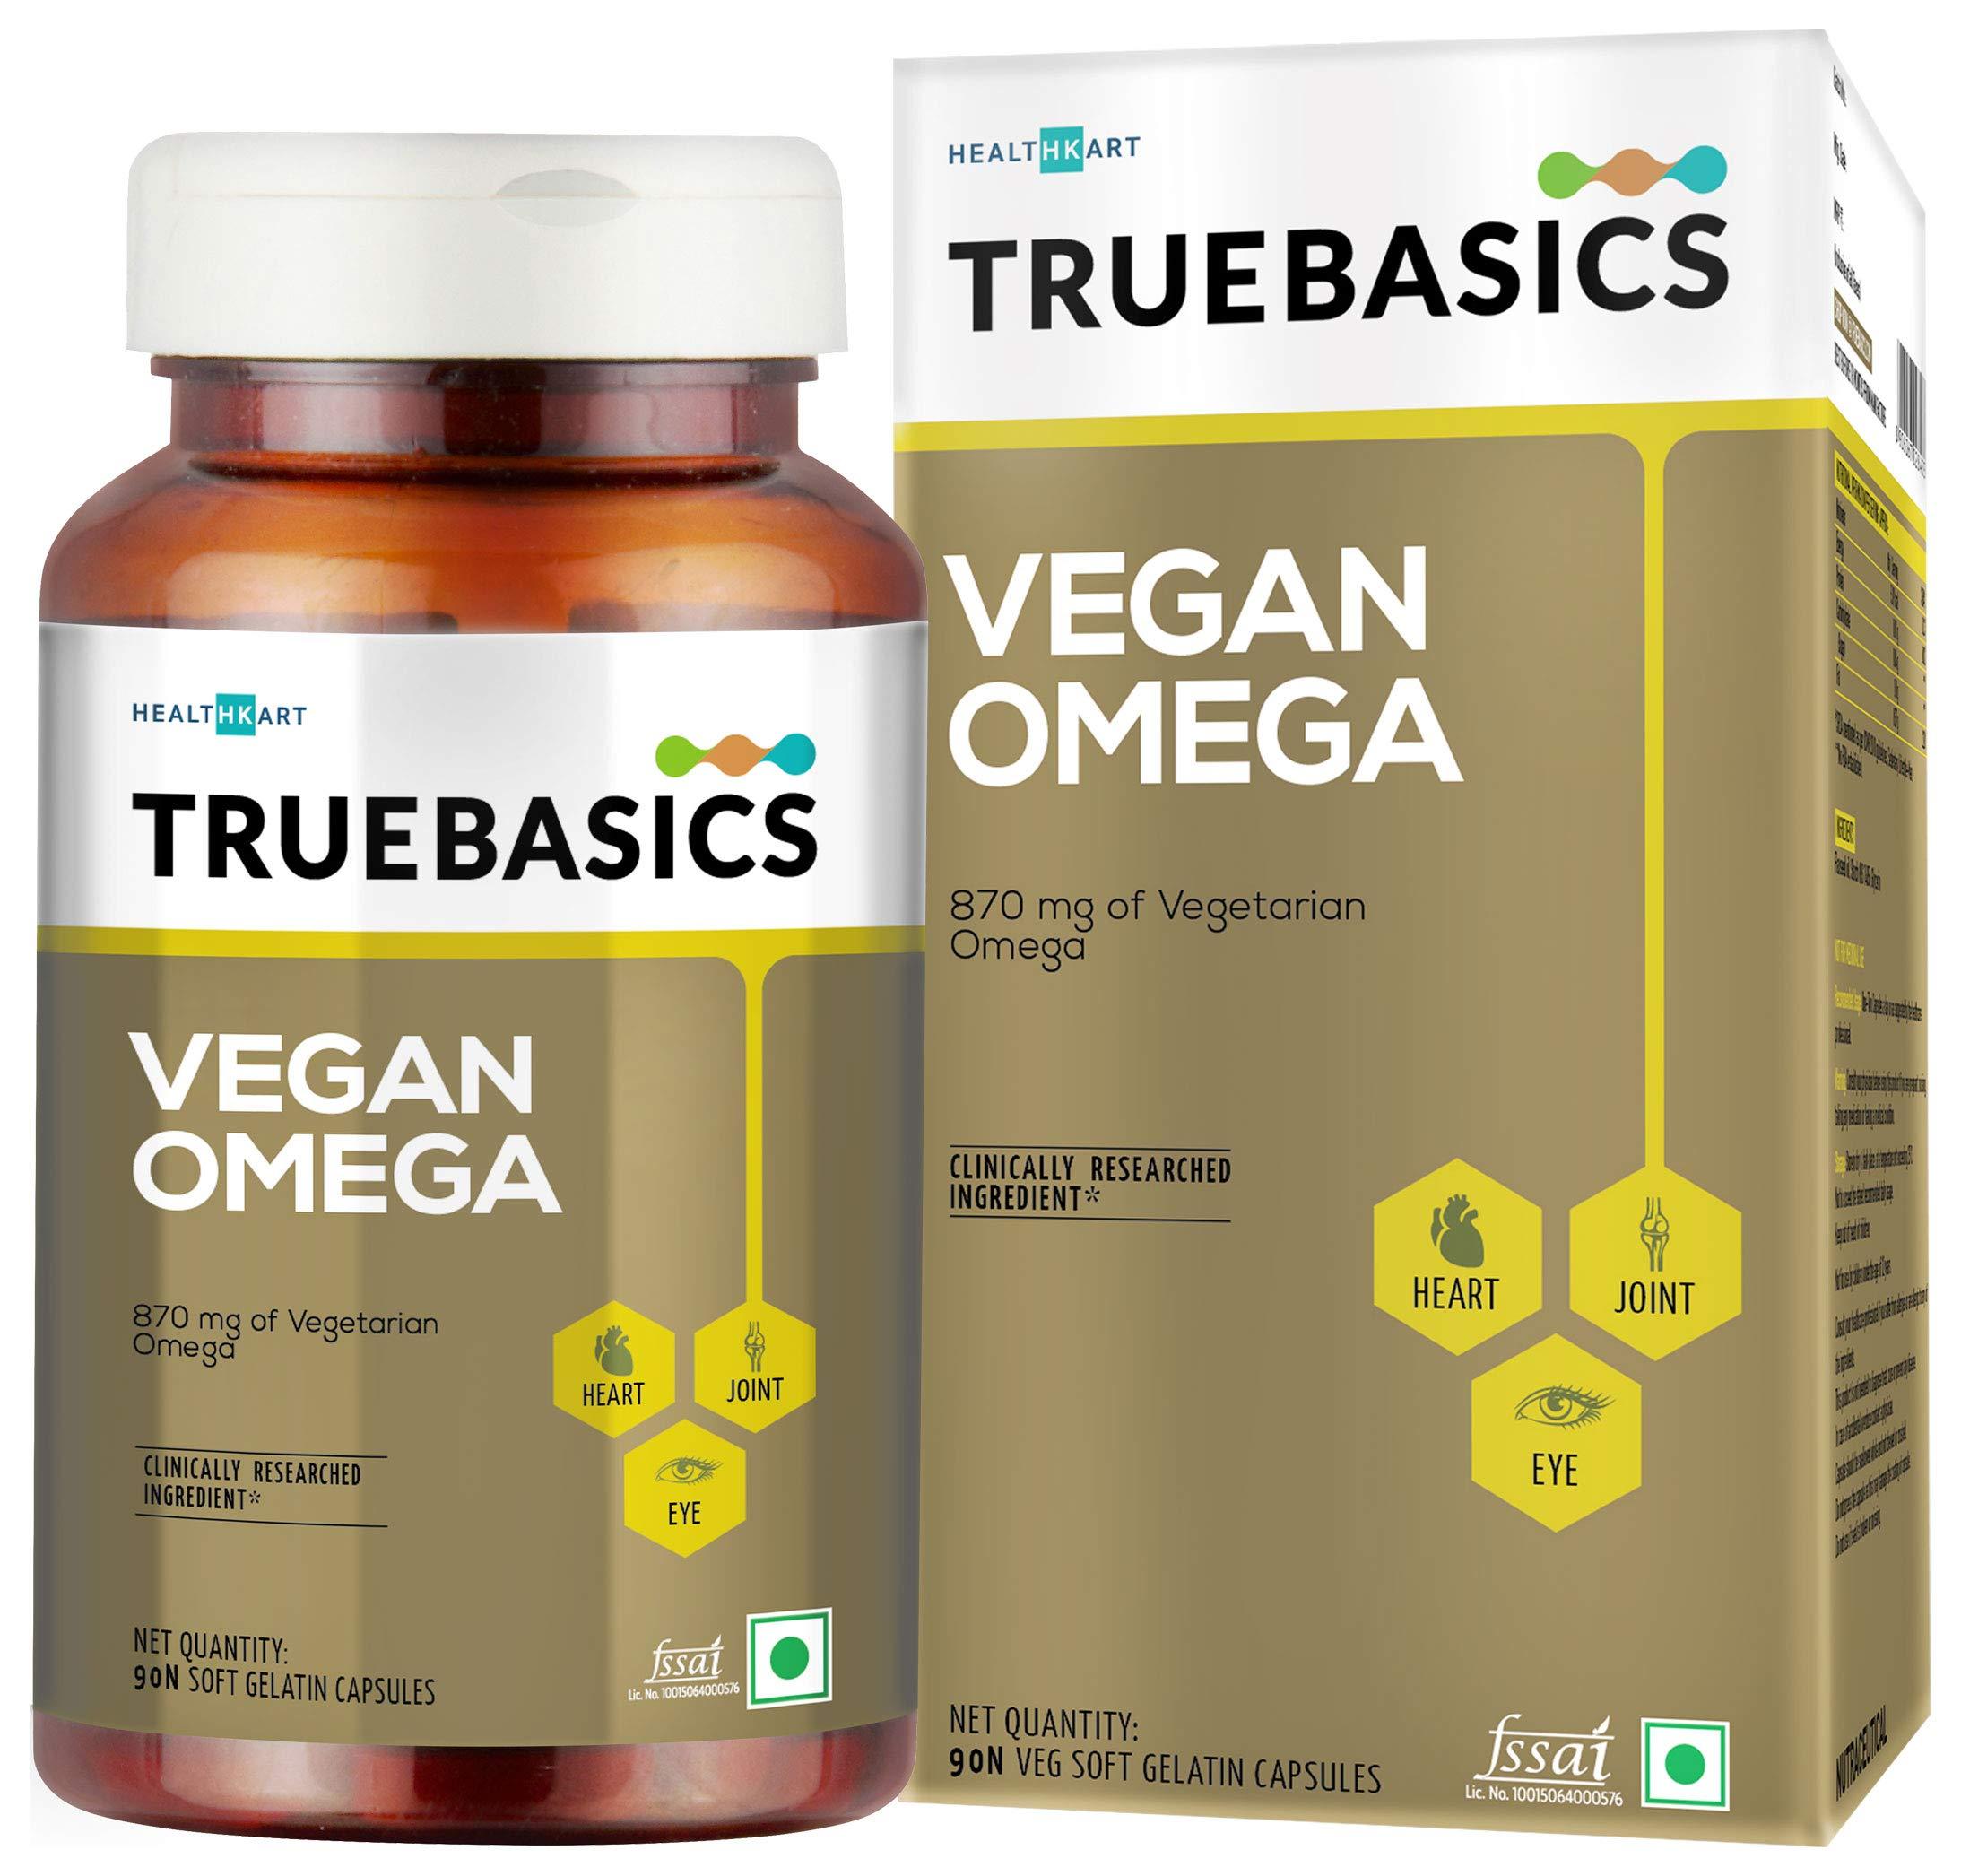 TrueBasics Vegan Omega, 870mg of Vegetarian Omega Fatty Acids, Nutrition Supplement for Heart, Hair, Skin, Joint, Brain & Eye Health, Clinically Researched - 90 Vegetarian Softgels